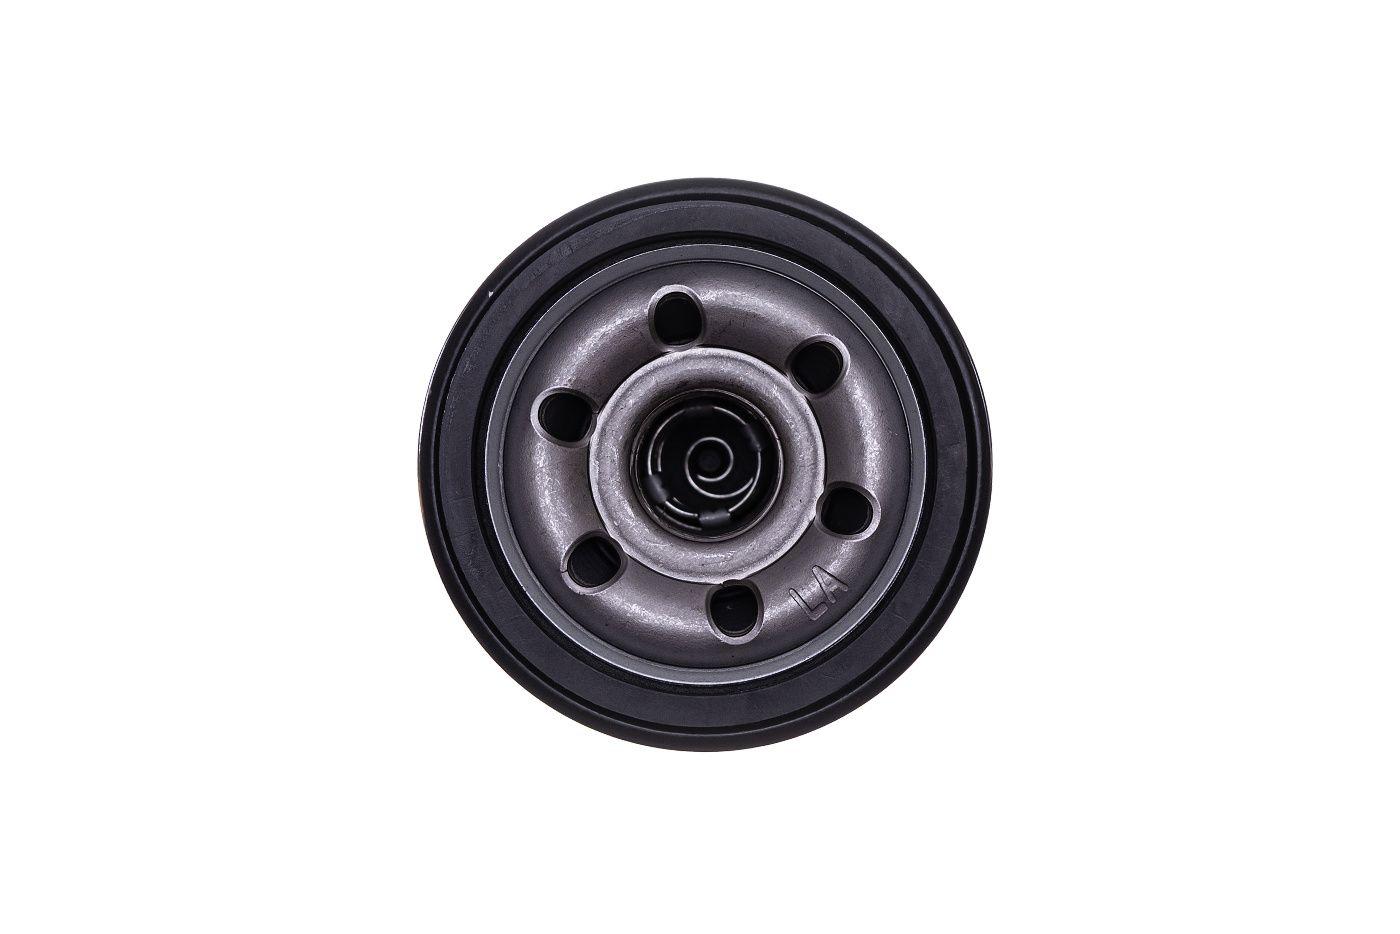 Olejový filter ZONGSHEN GB680 XP680 GB1000 - 100004087-0001